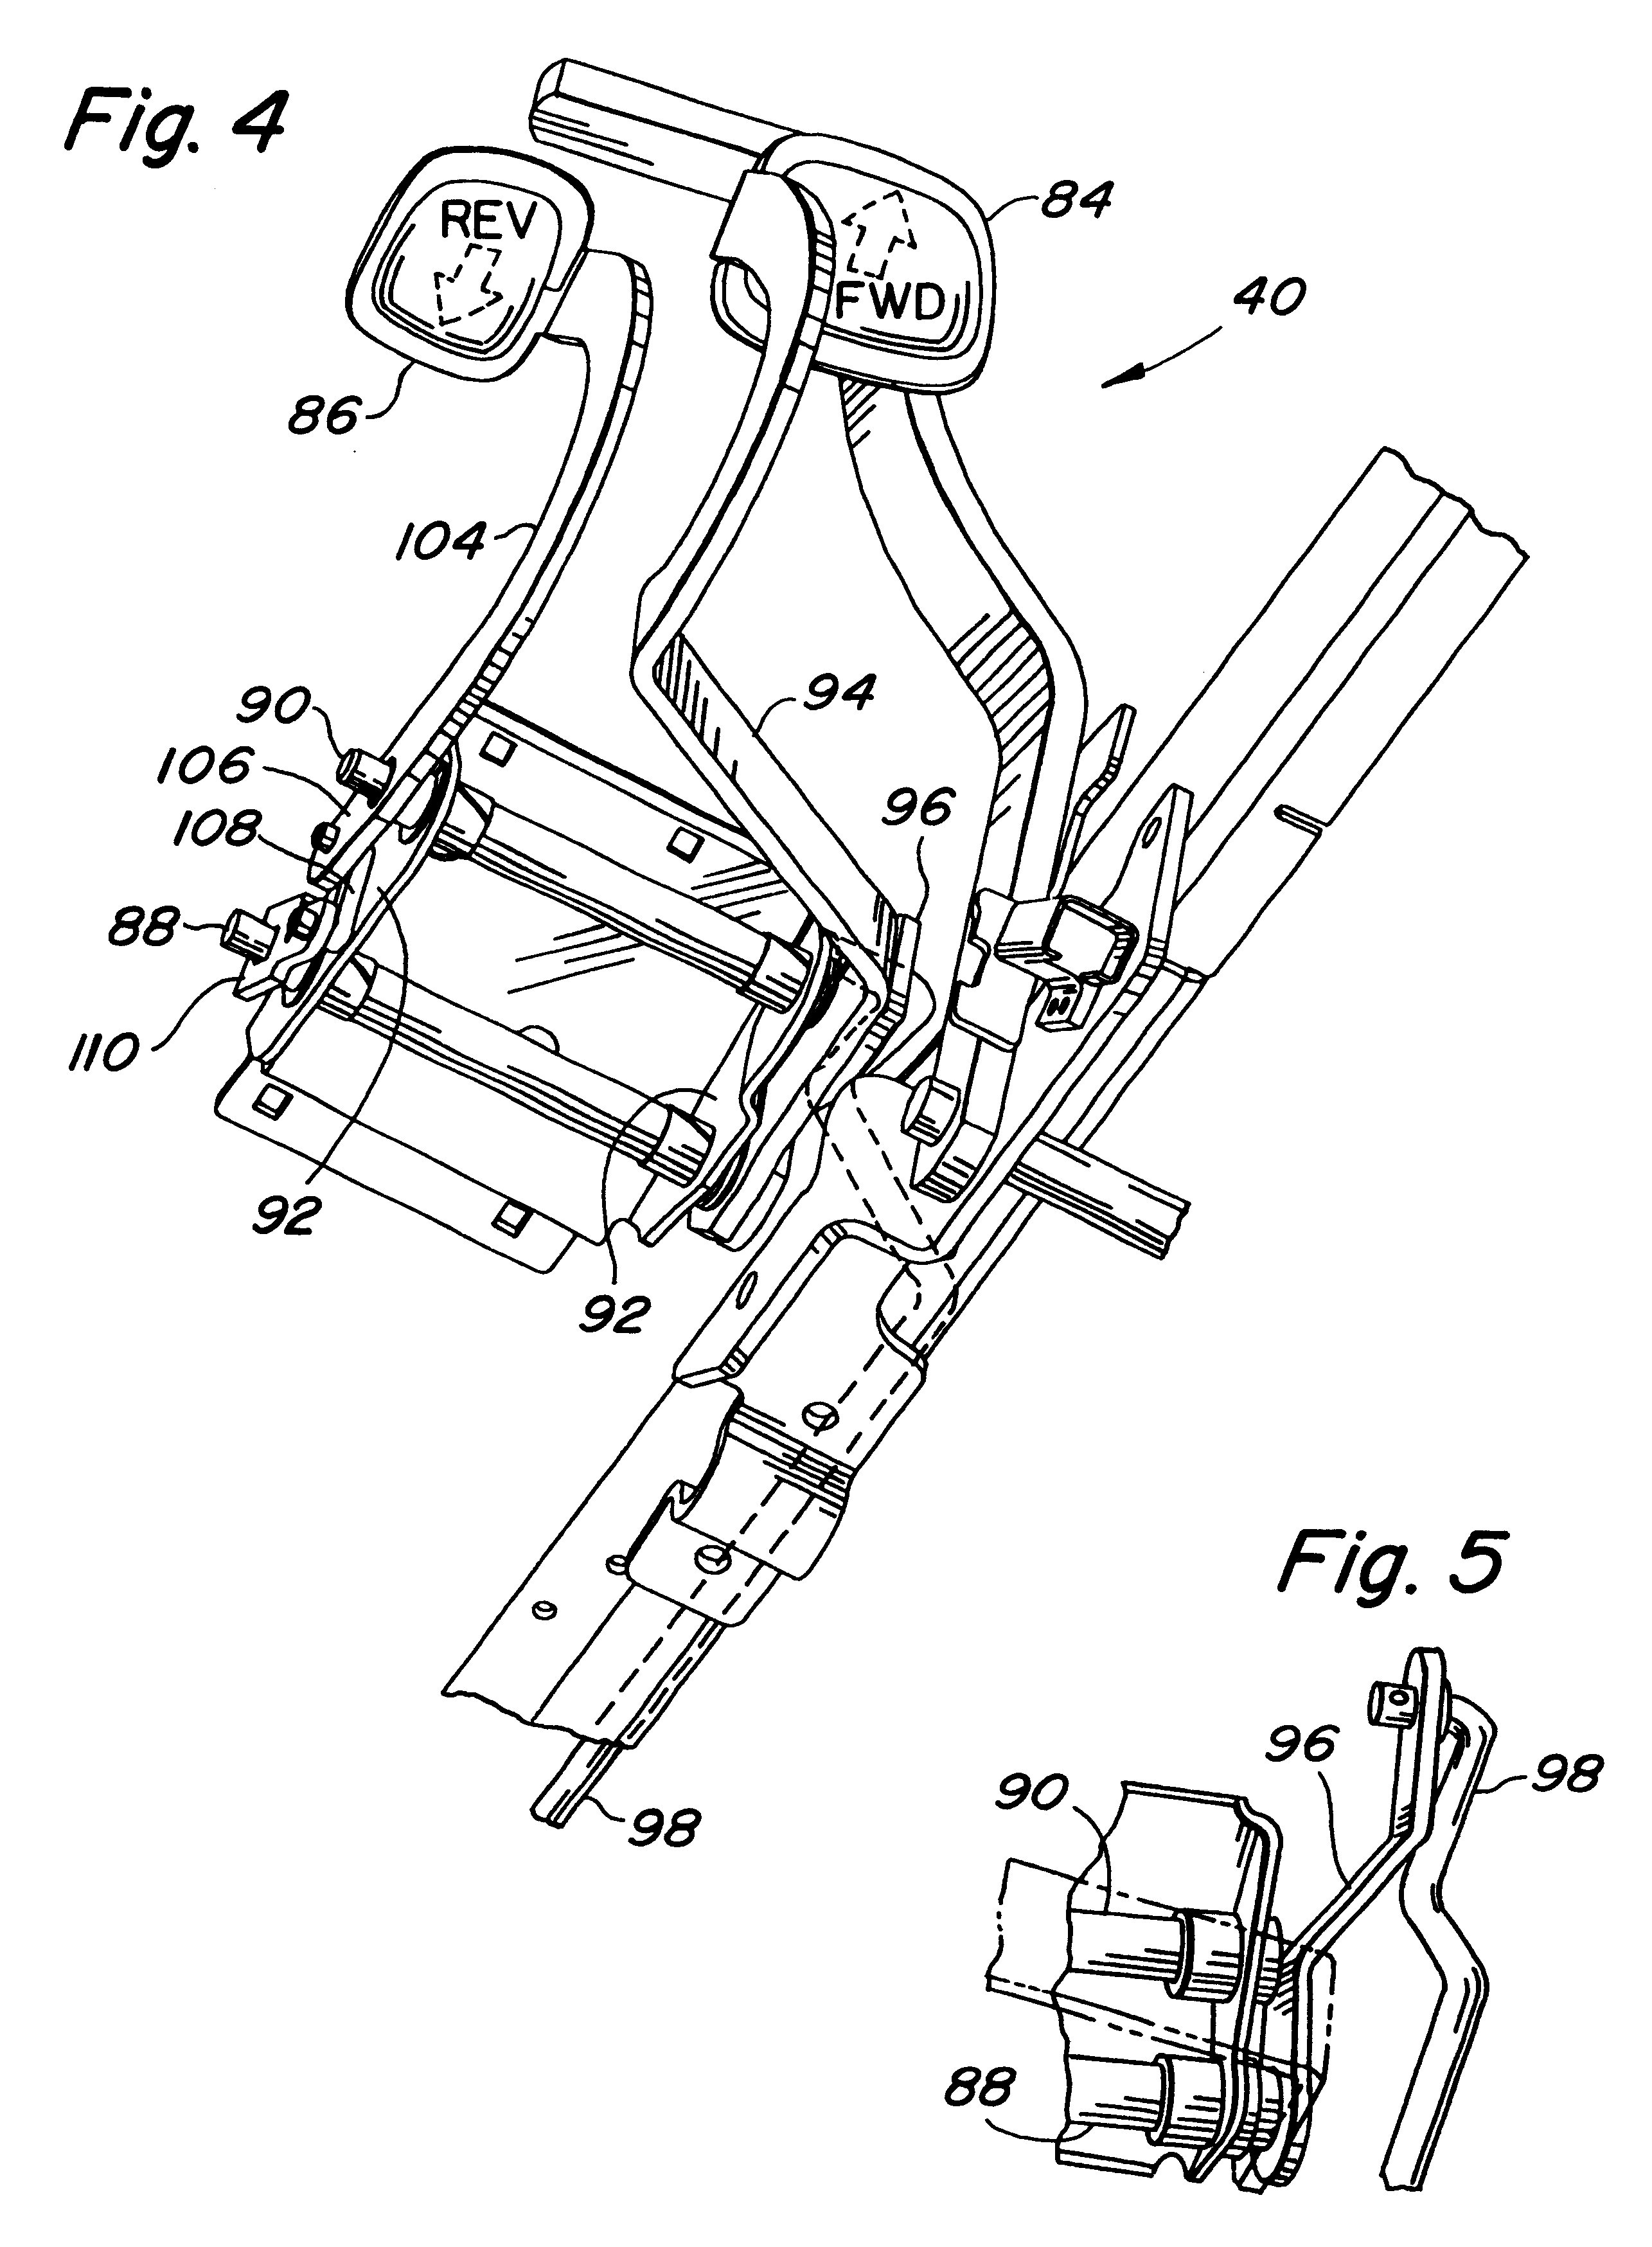 Dixon Ztr Ram 50 Wiring Honda Civic Engine Mount Diagram 4423 Riding Lawn Mower For Ram44 Auto Us06484827 20021126 D00004